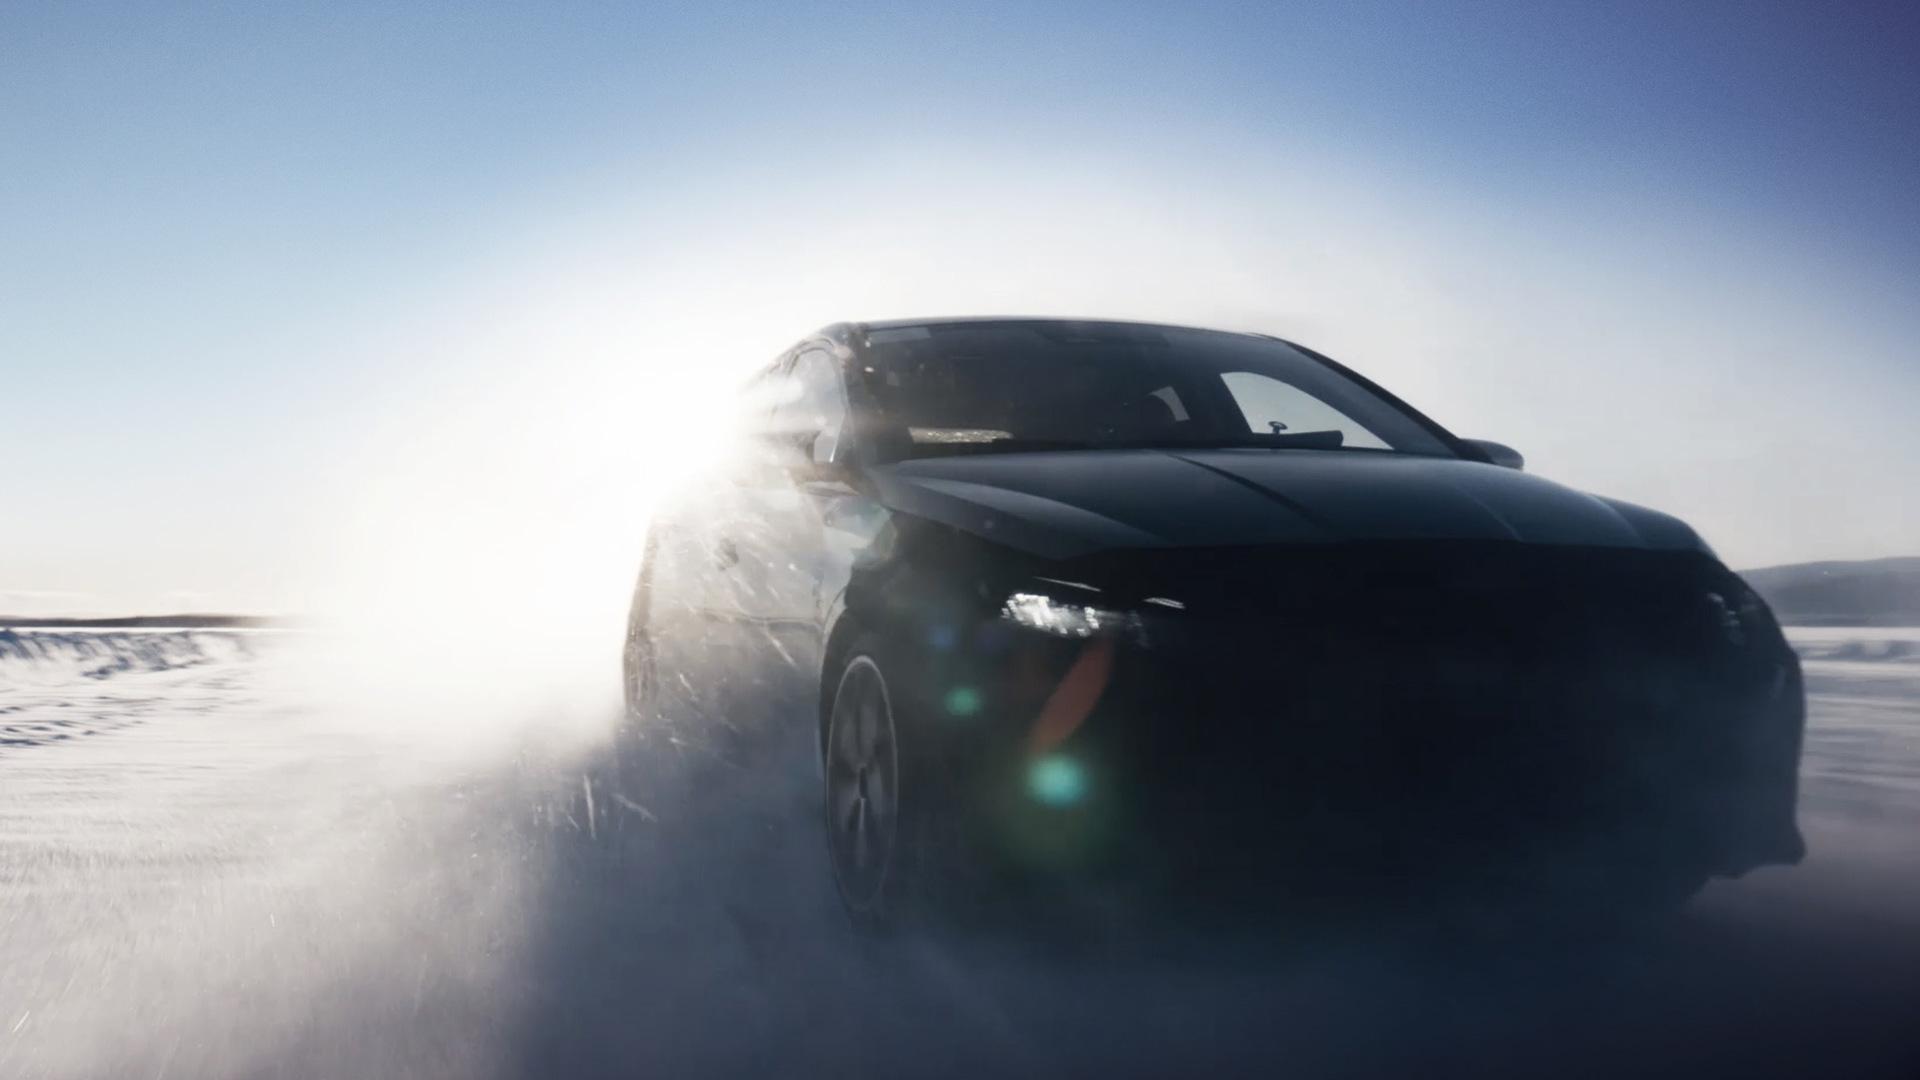 2021 Hyundai i20 N prototype